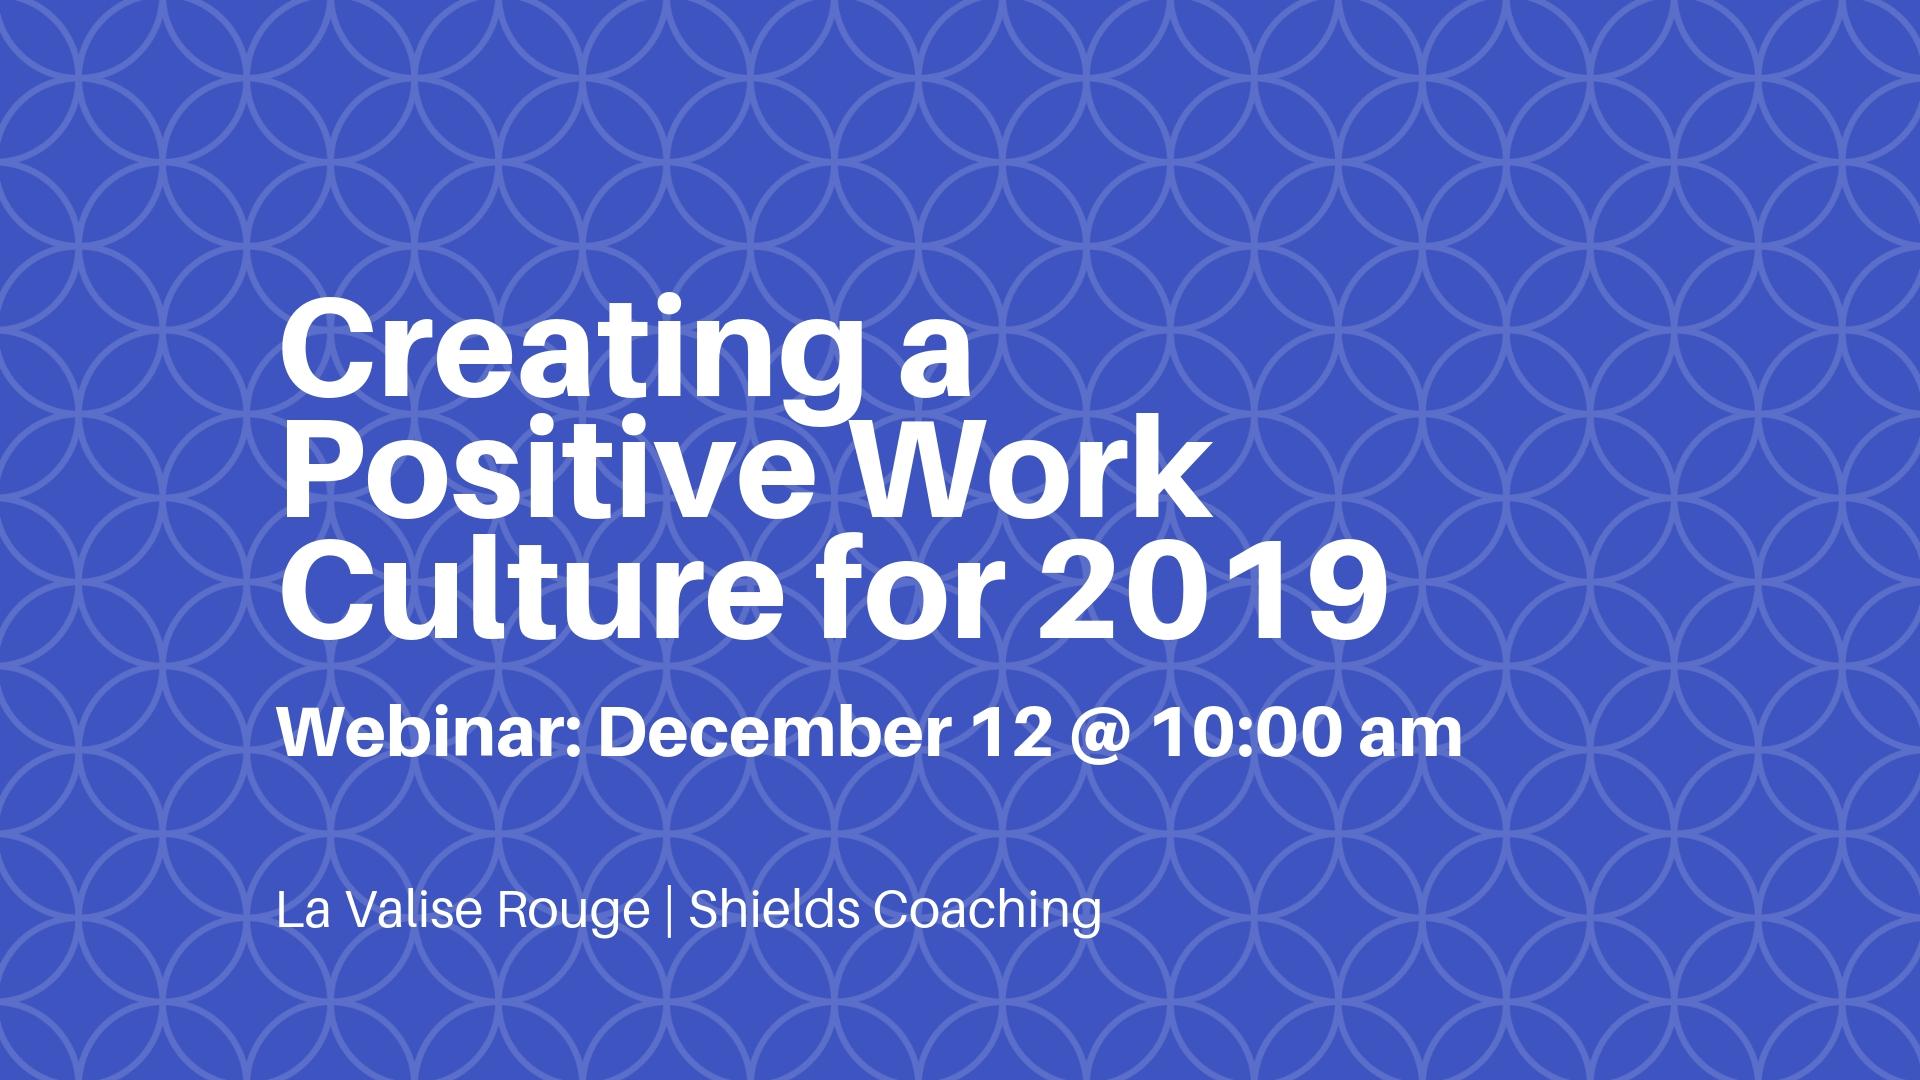 Creating a Positive Work Culture for 2019 webinar.jpg